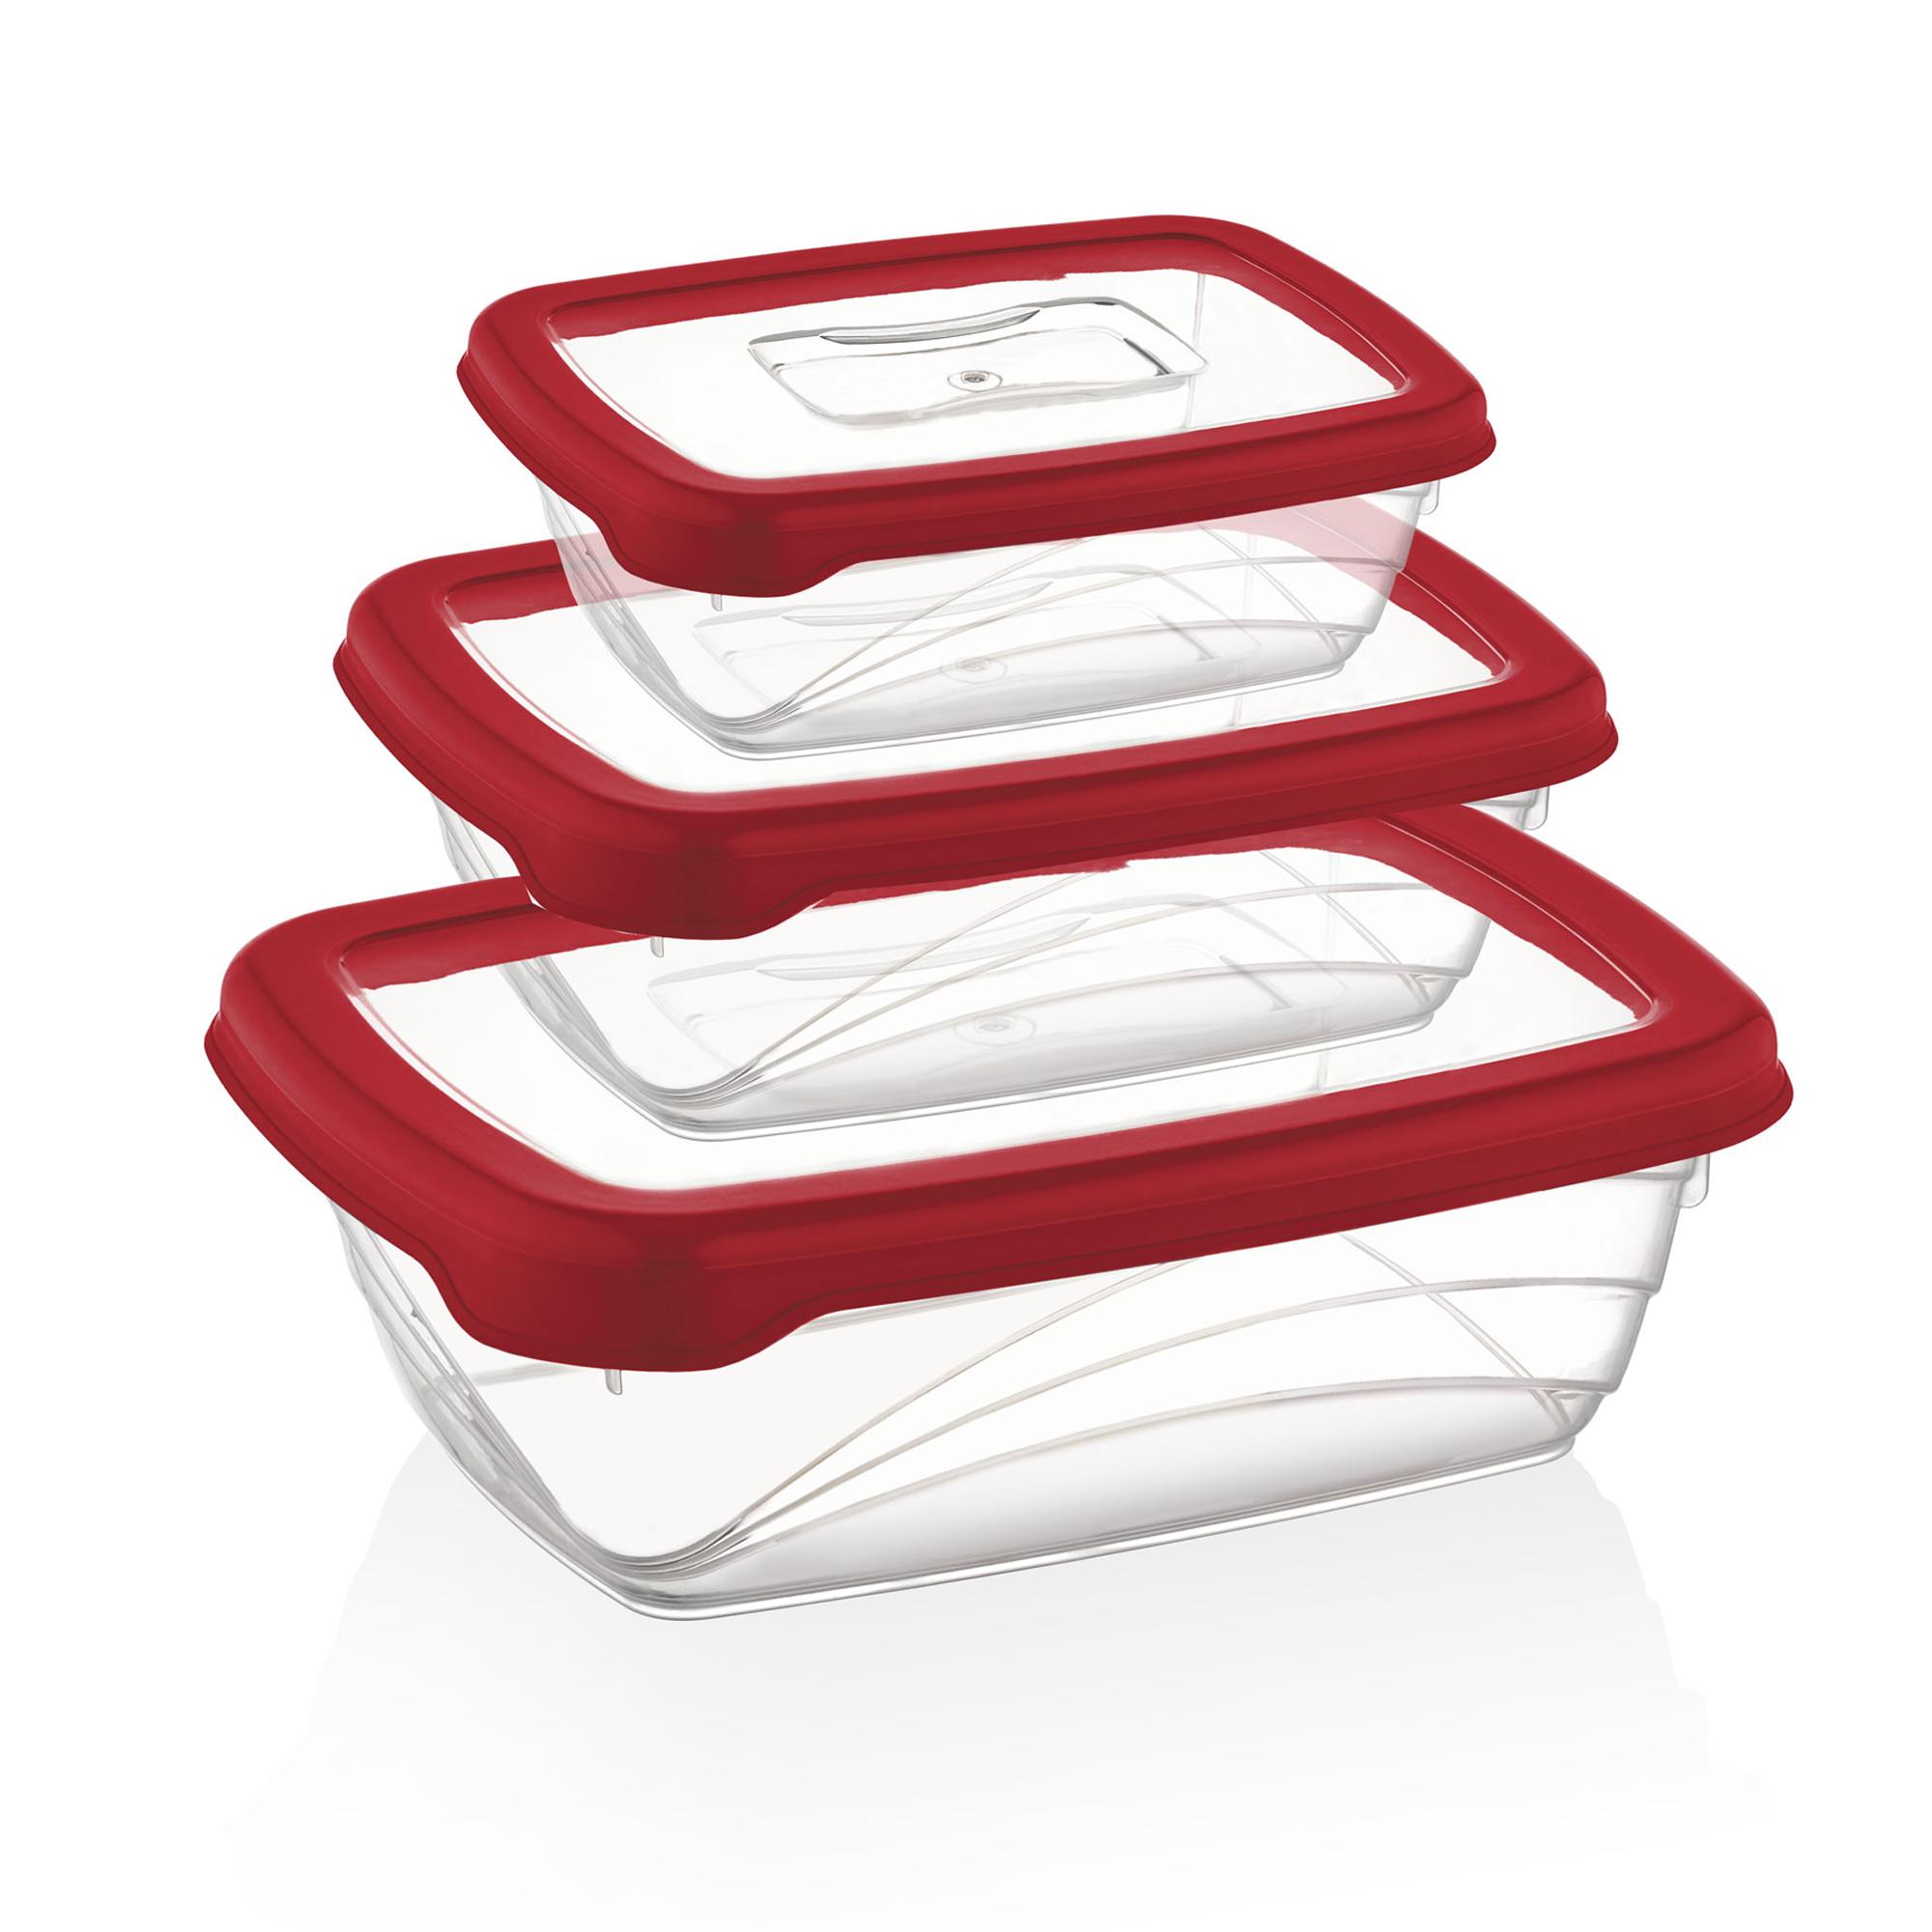 Herzberg HG-L686 : 3 pièces Bio Saver Box Rouge